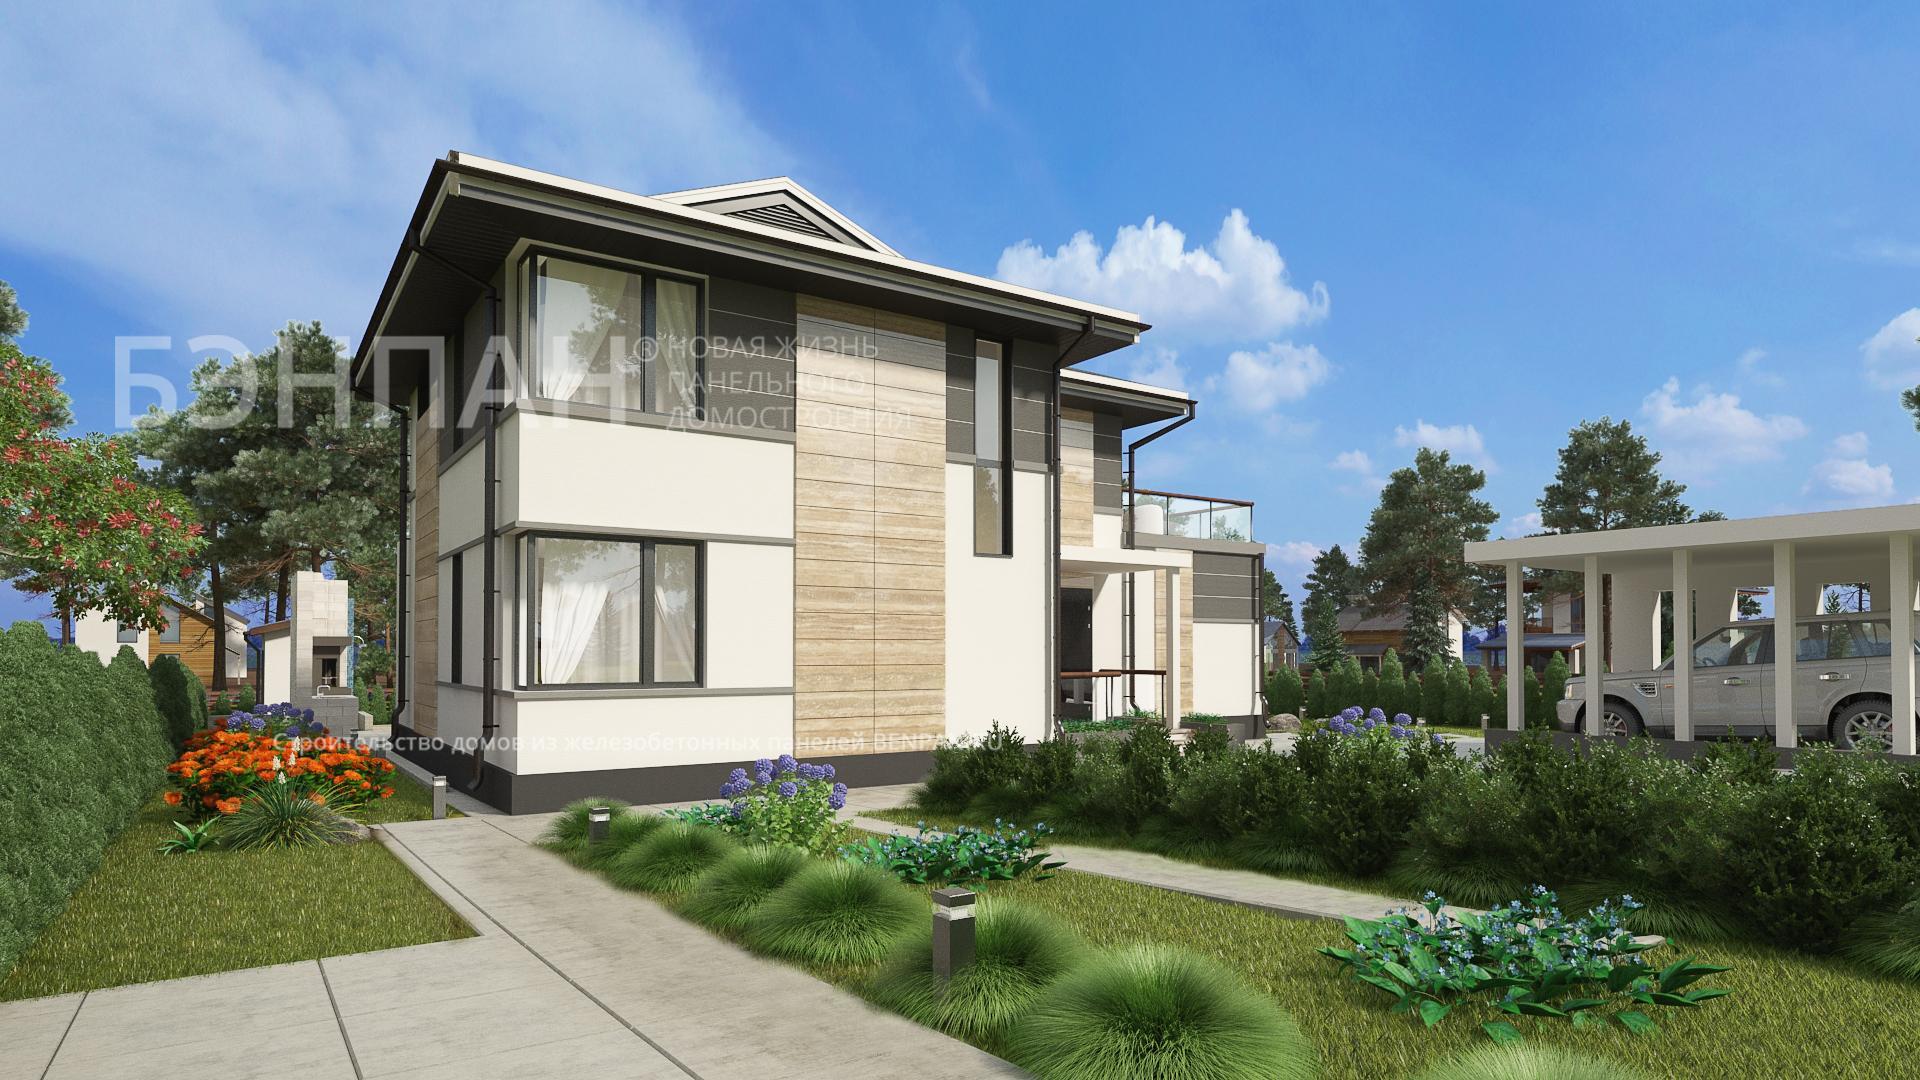 Фото дома МС-224 136.40м2, этажа 2, комнаты 6, проект для загородного дома